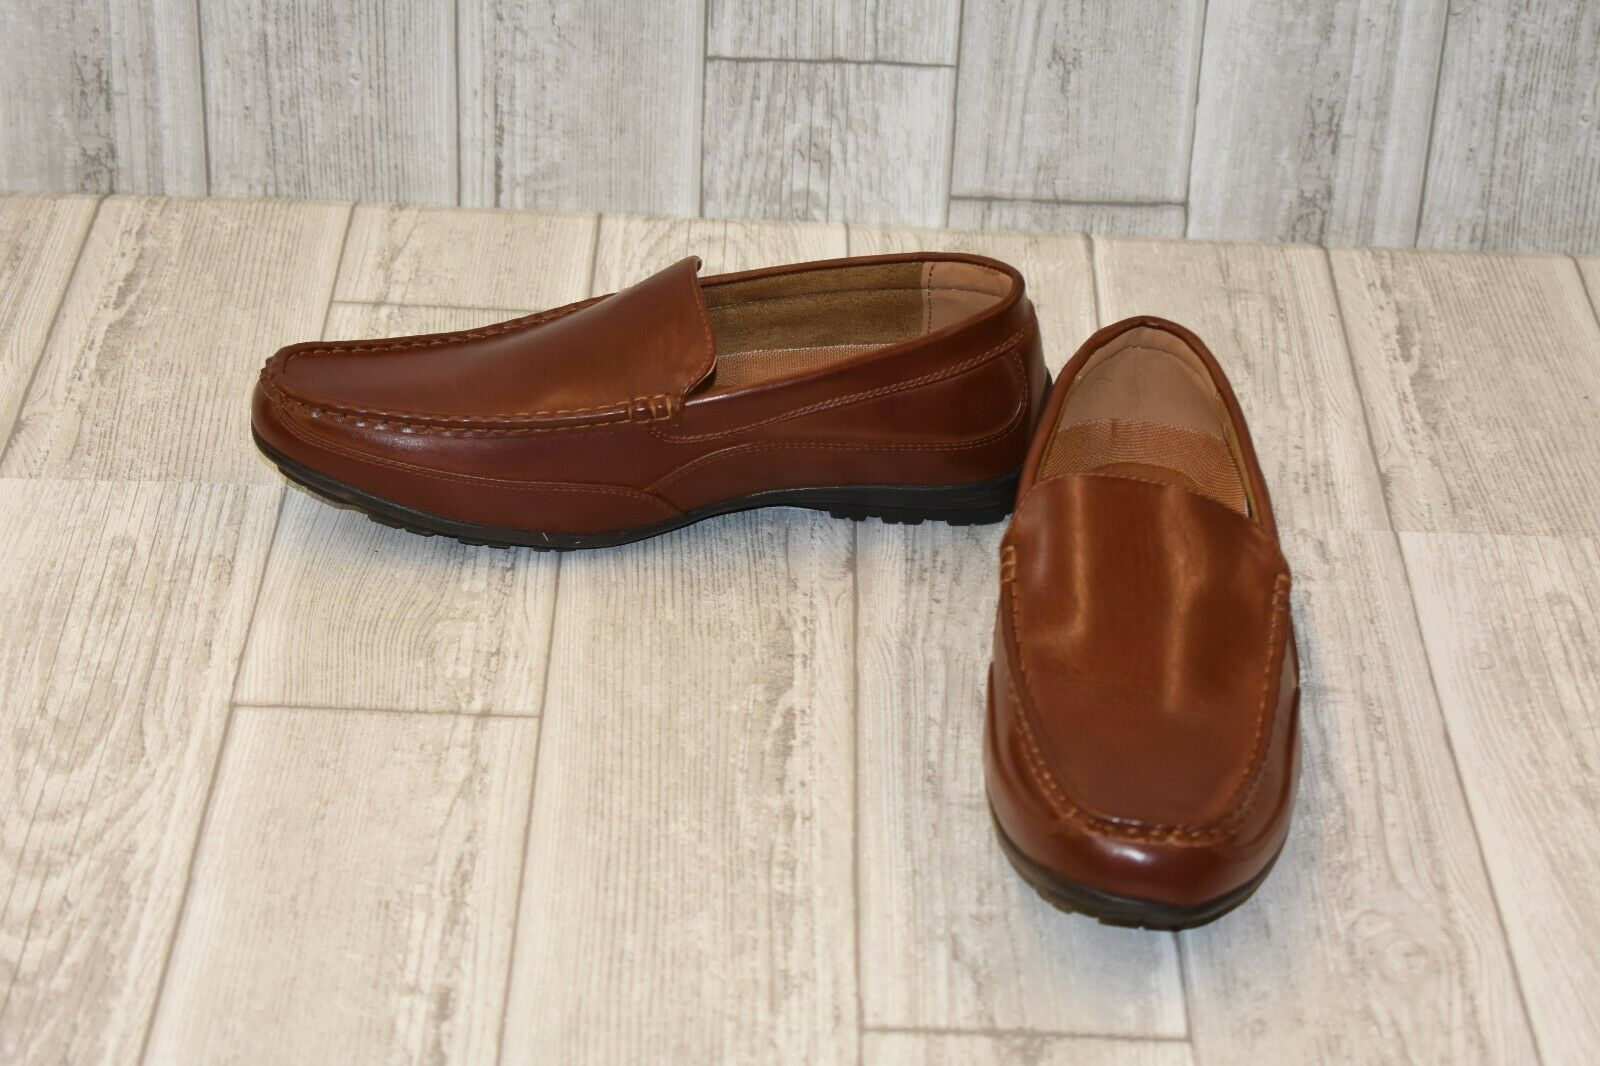 Deer Stags Drive Slip-On Loafer - Men's Size 9.5M - Brown